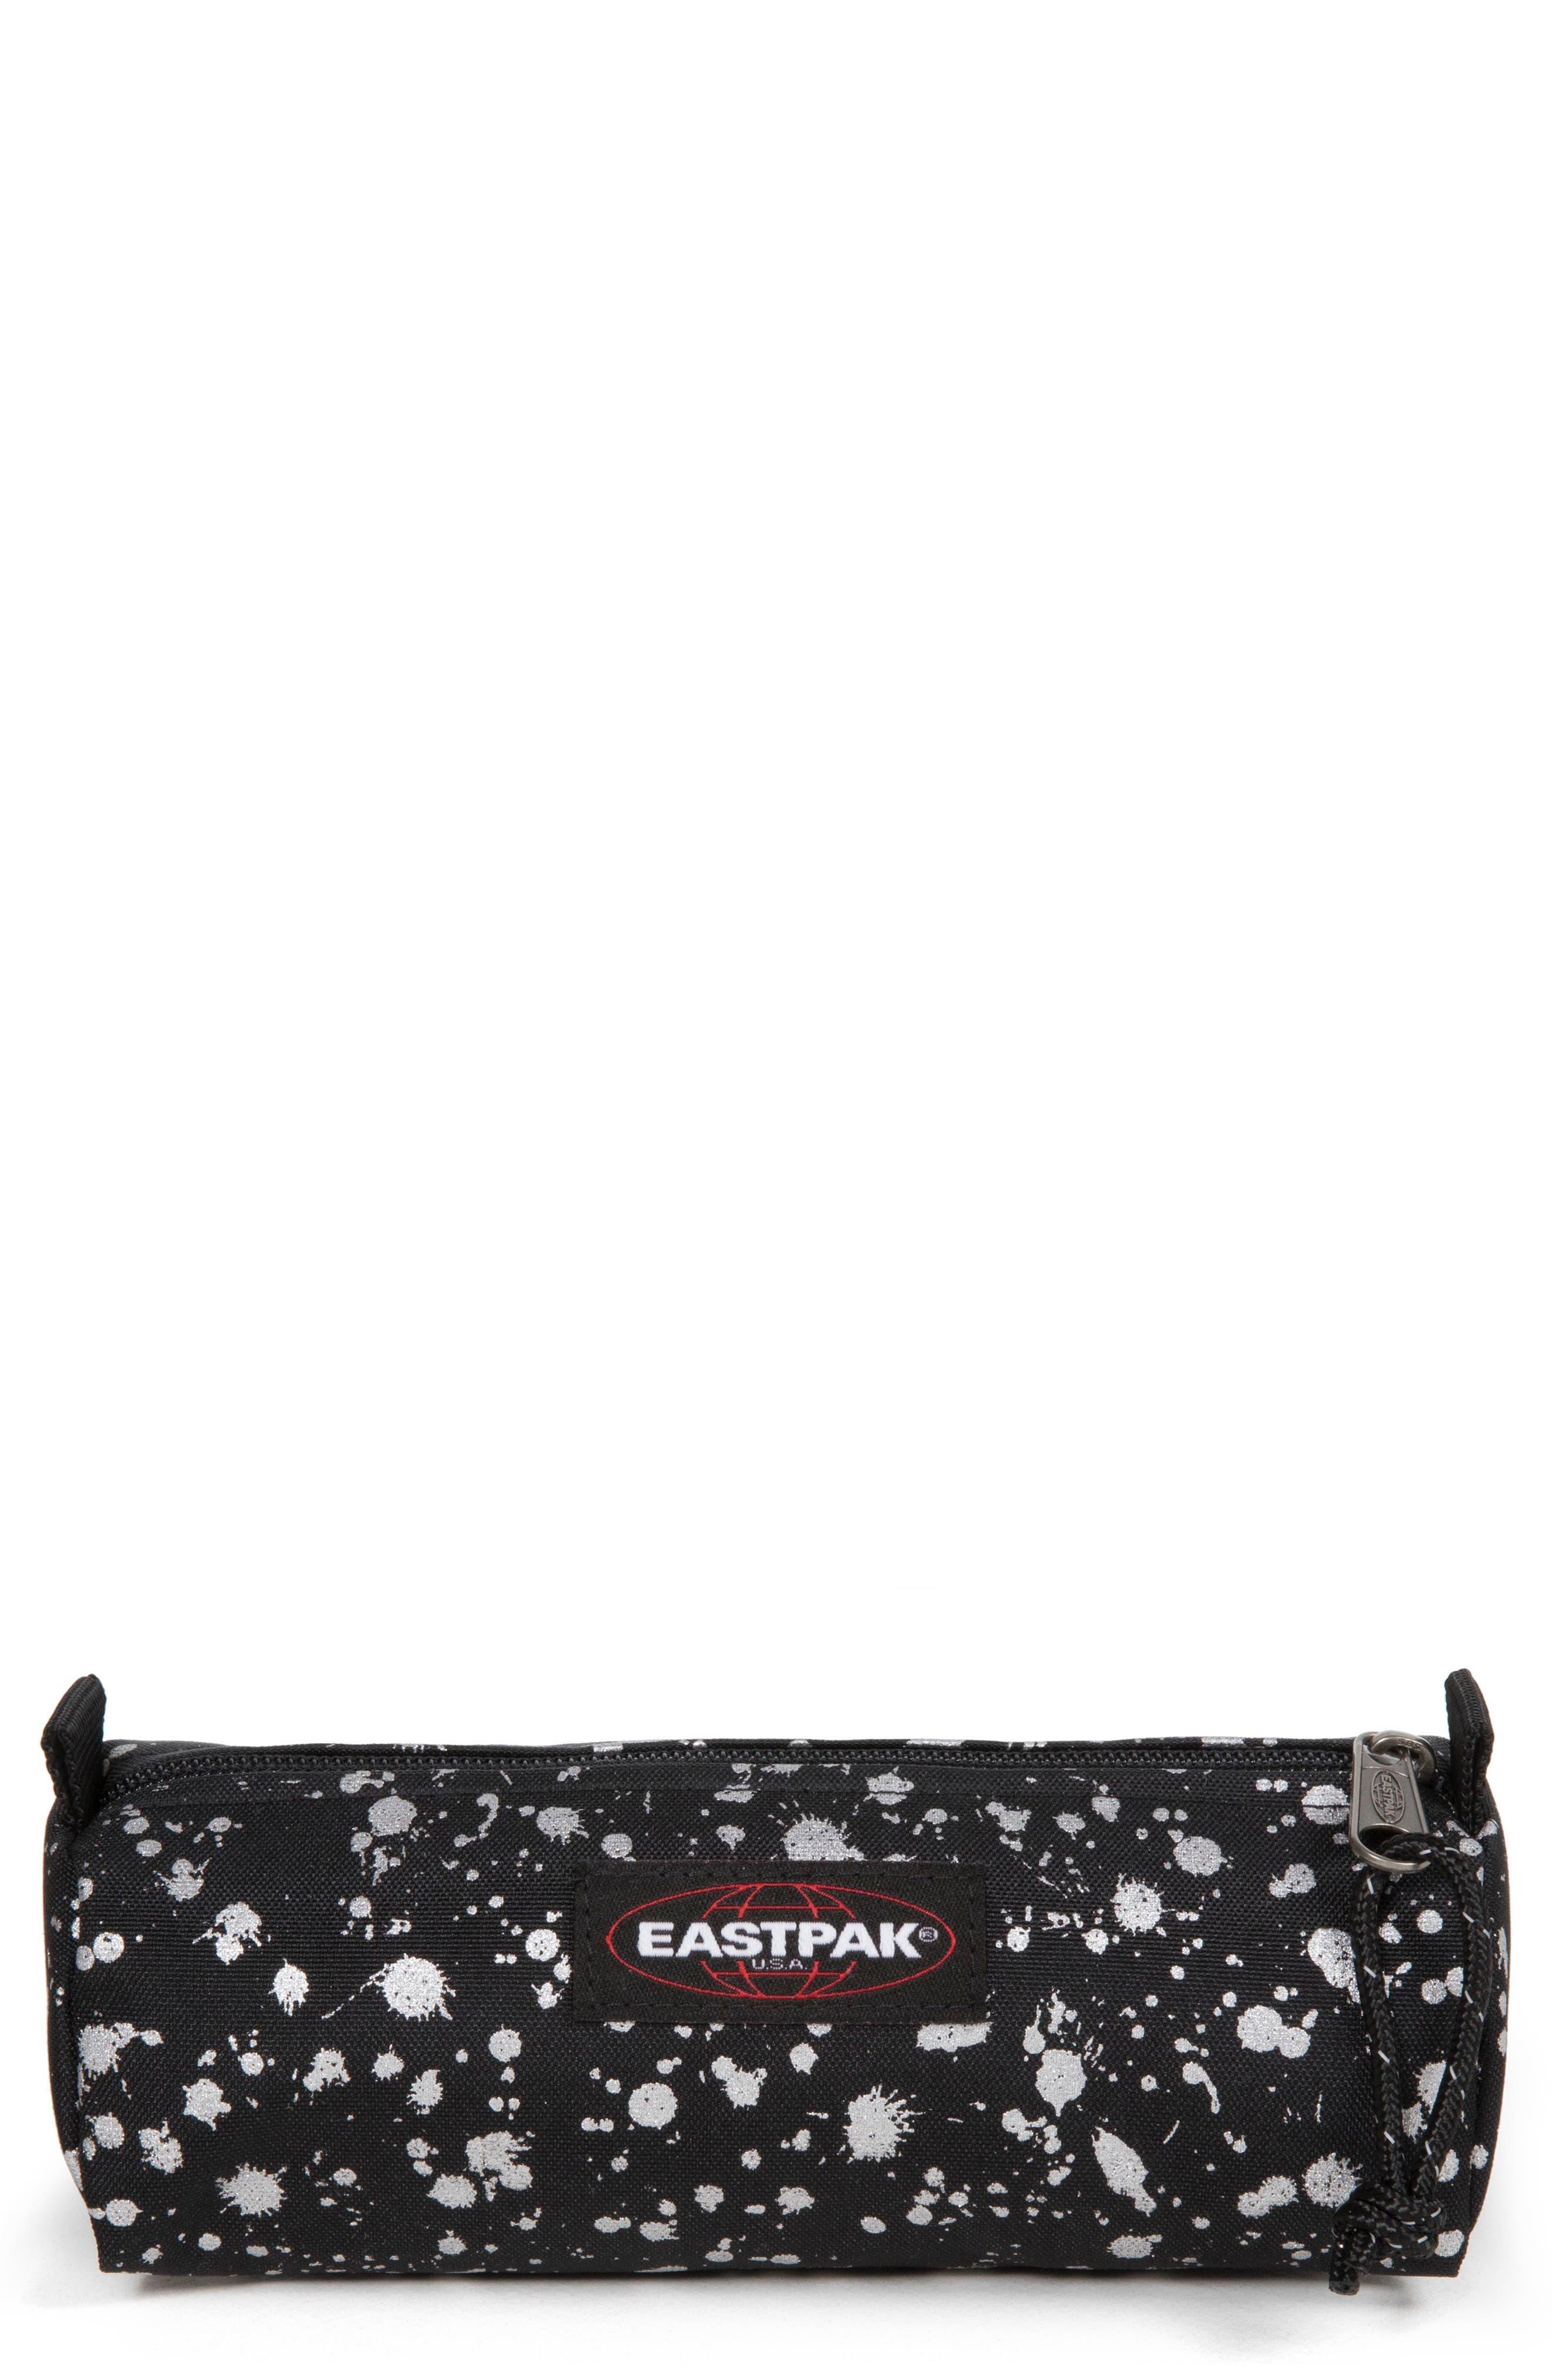 EASTPAK Benchmark Large Pencil Case, Main, color, SILVER MIST